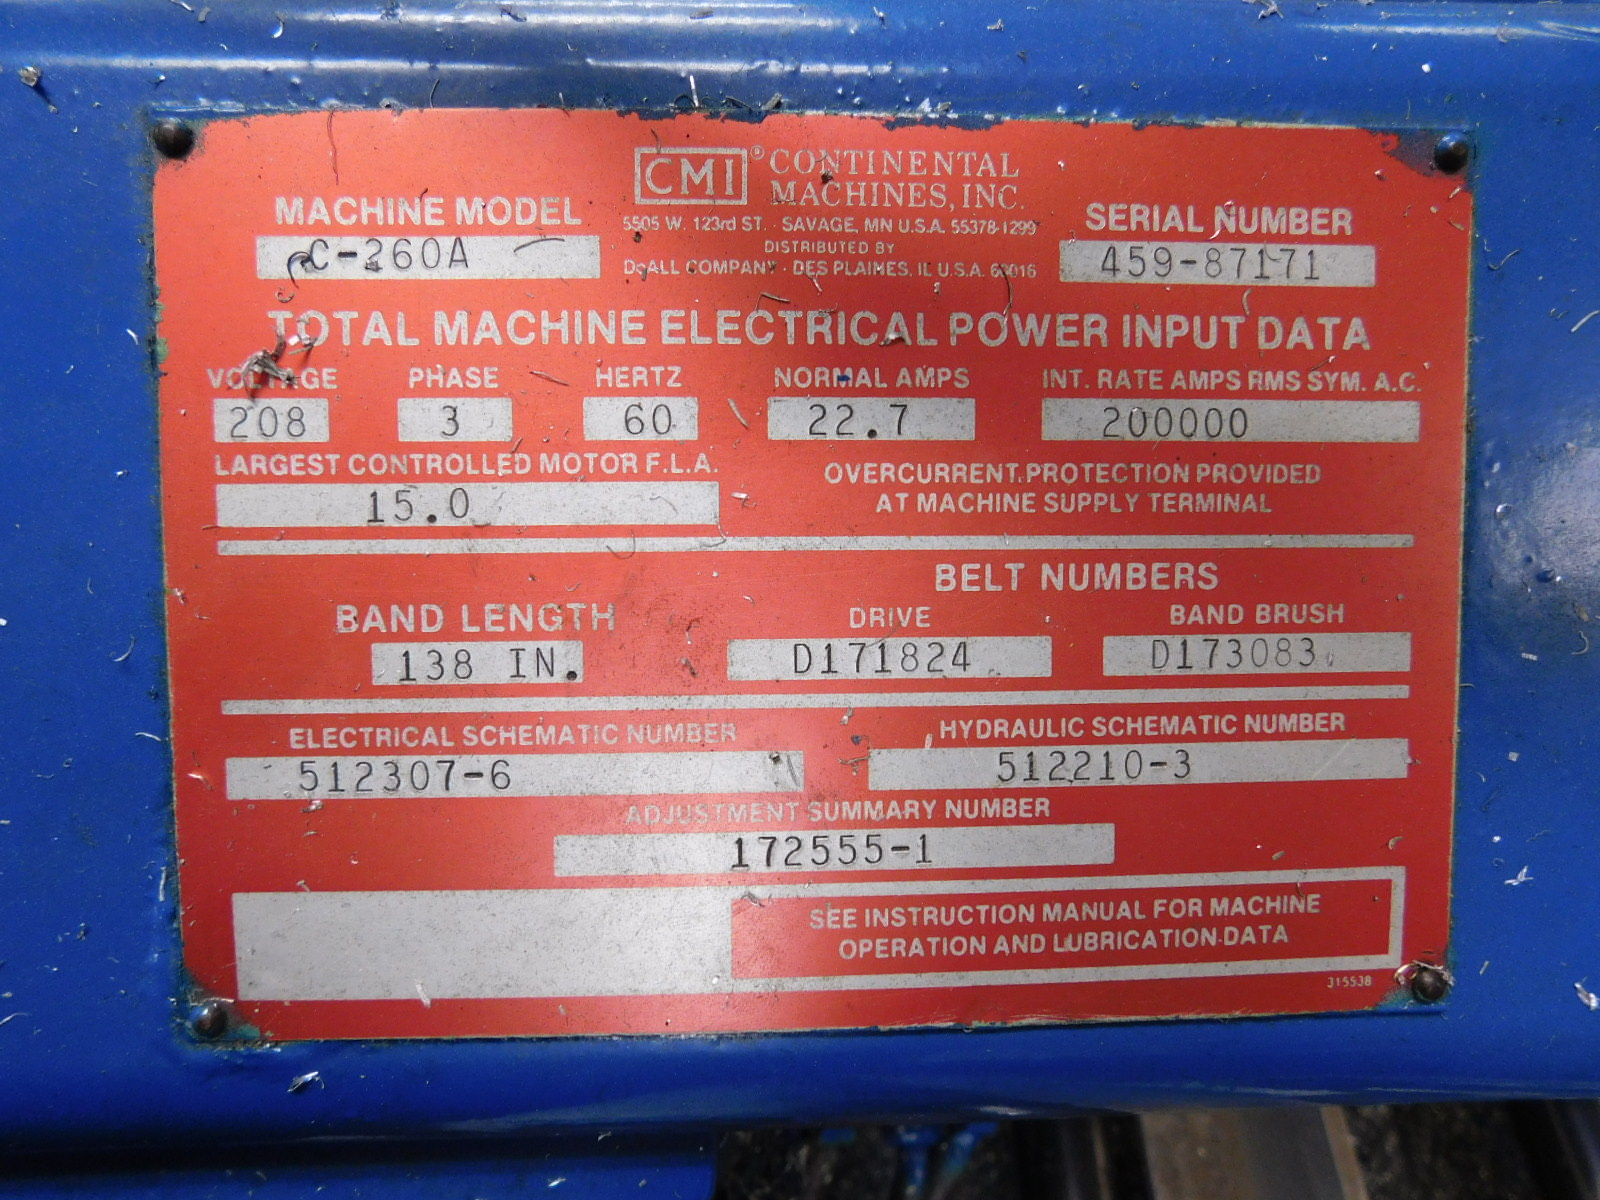 Lot 16 - DOALL HORIZONTAL BAND SAW, MODEL C-260A, S/N 459-87171